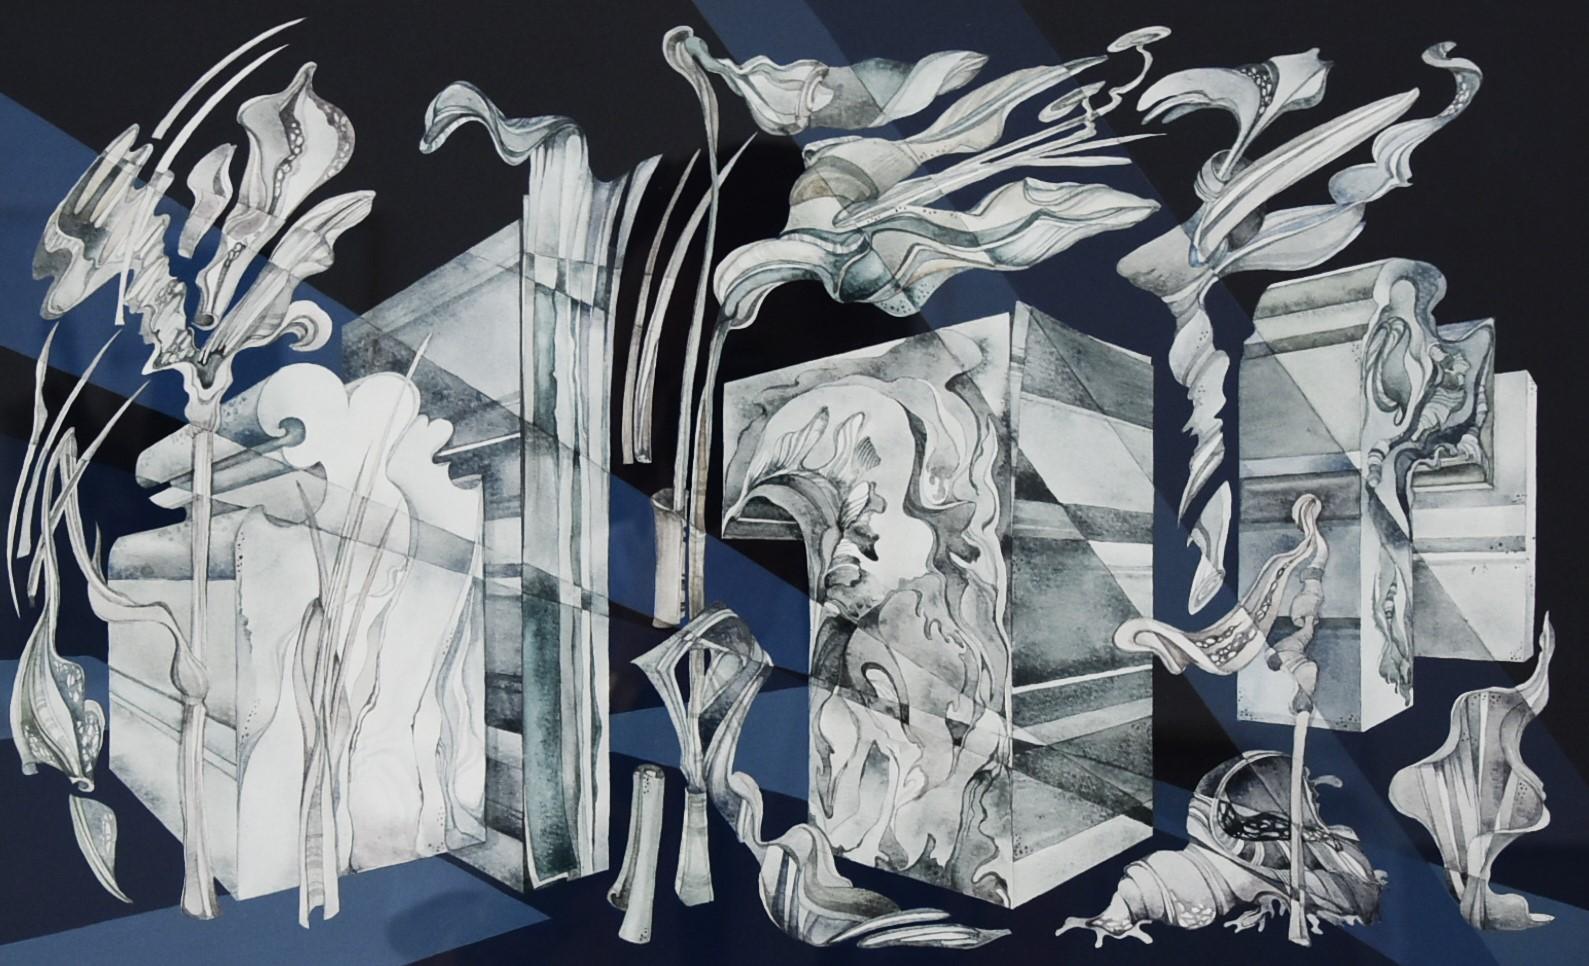 Capriccio w błękicie, 2016